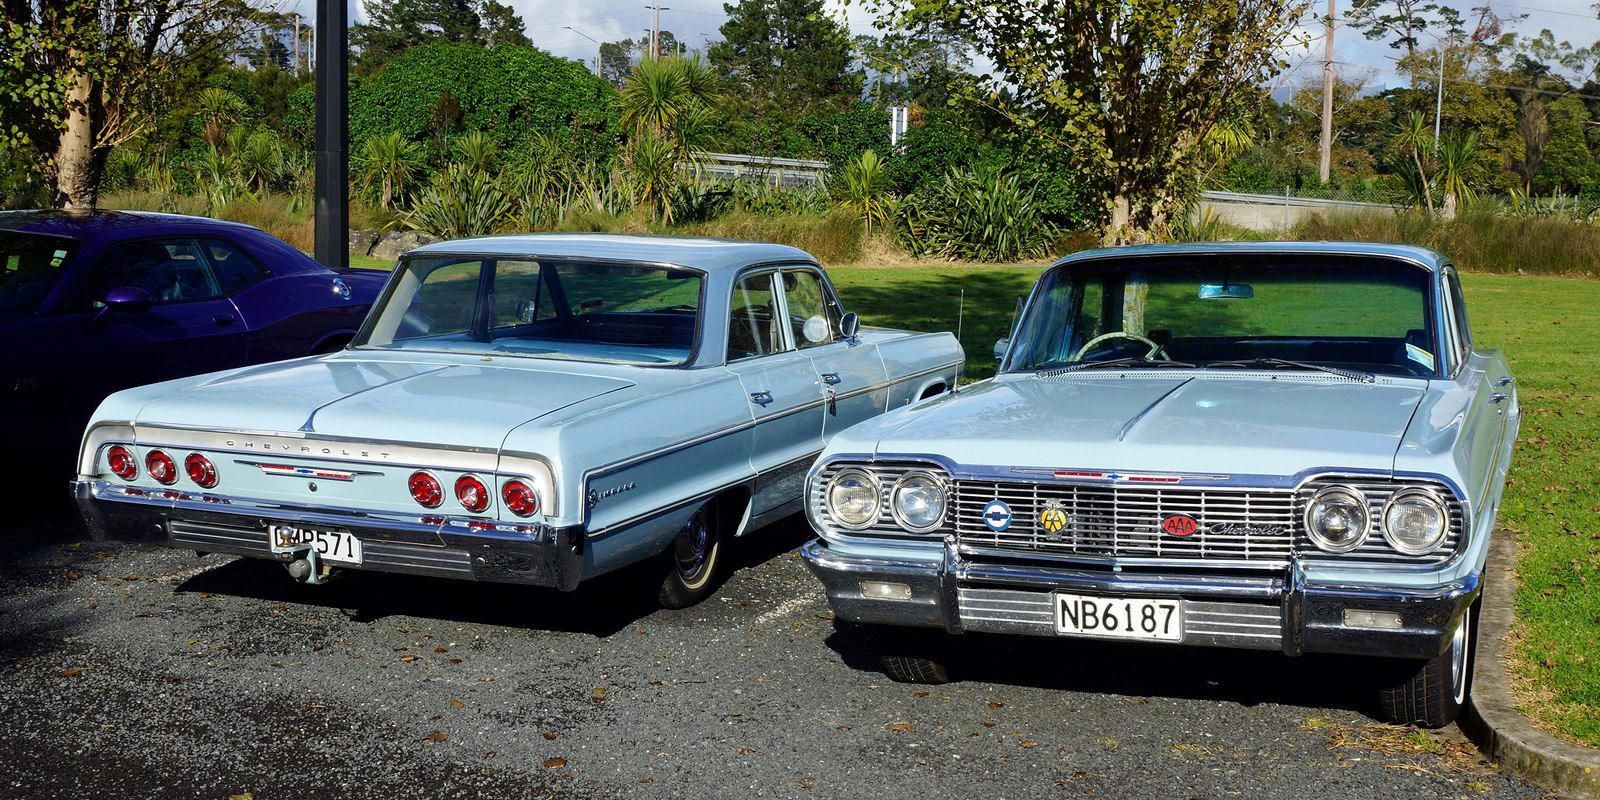 1964 Chevrolet Impala X 2 At Auckland Nz Chevroletclassiccars